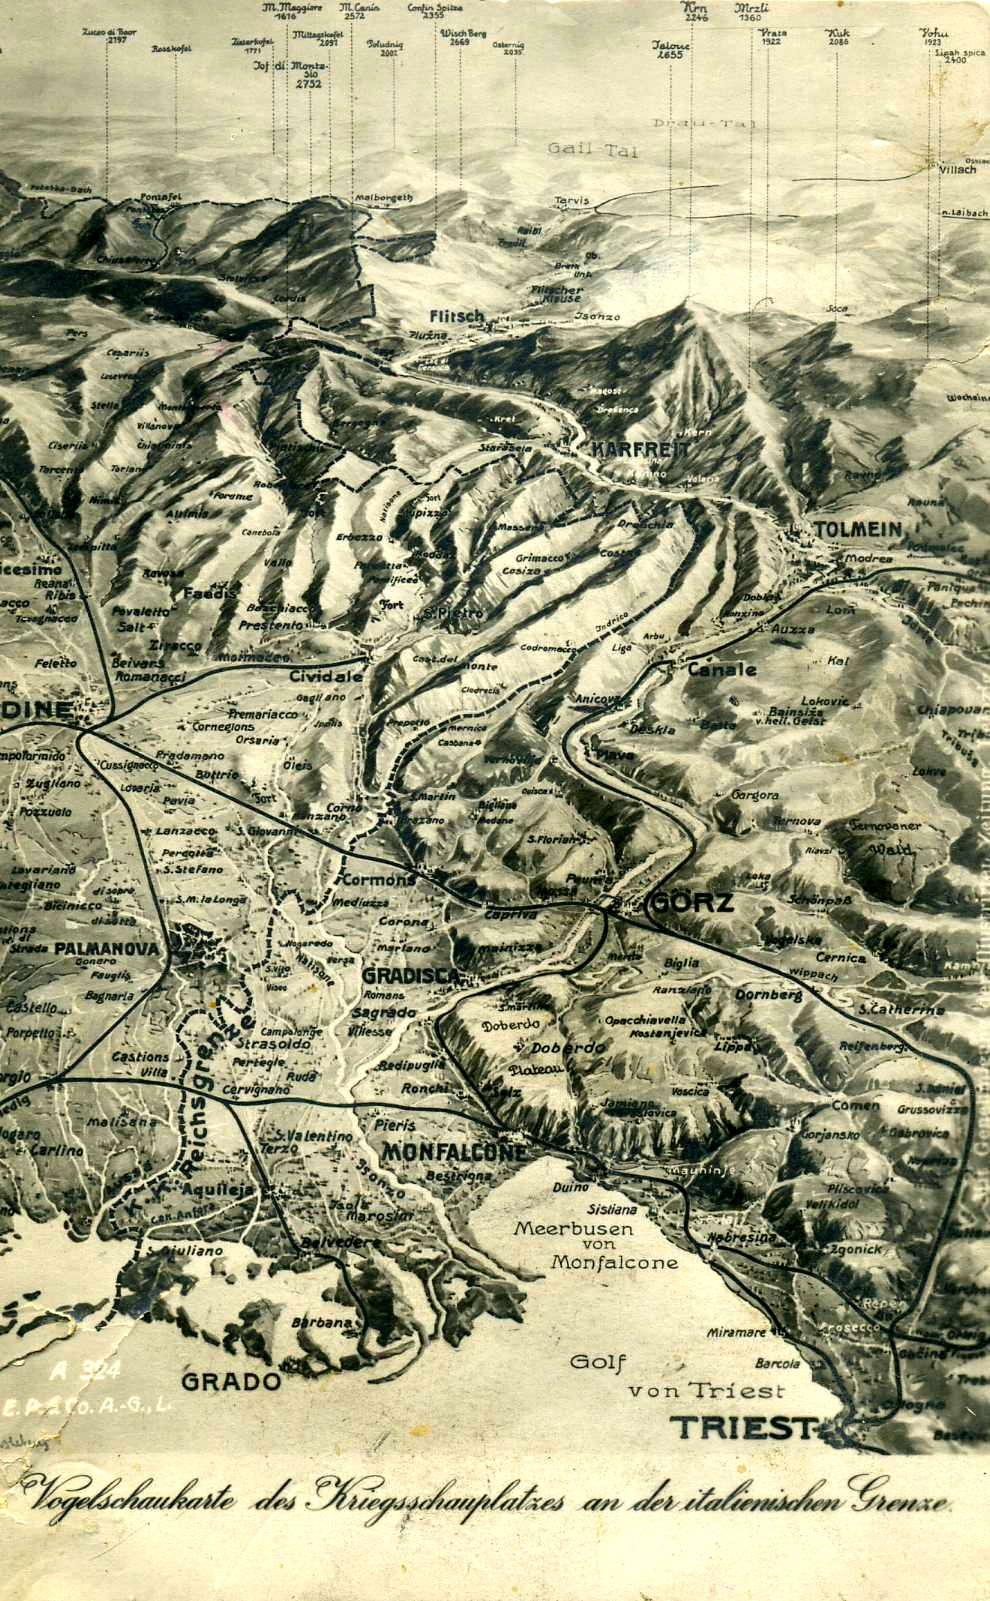 mappa kustenland austriaco.jpg